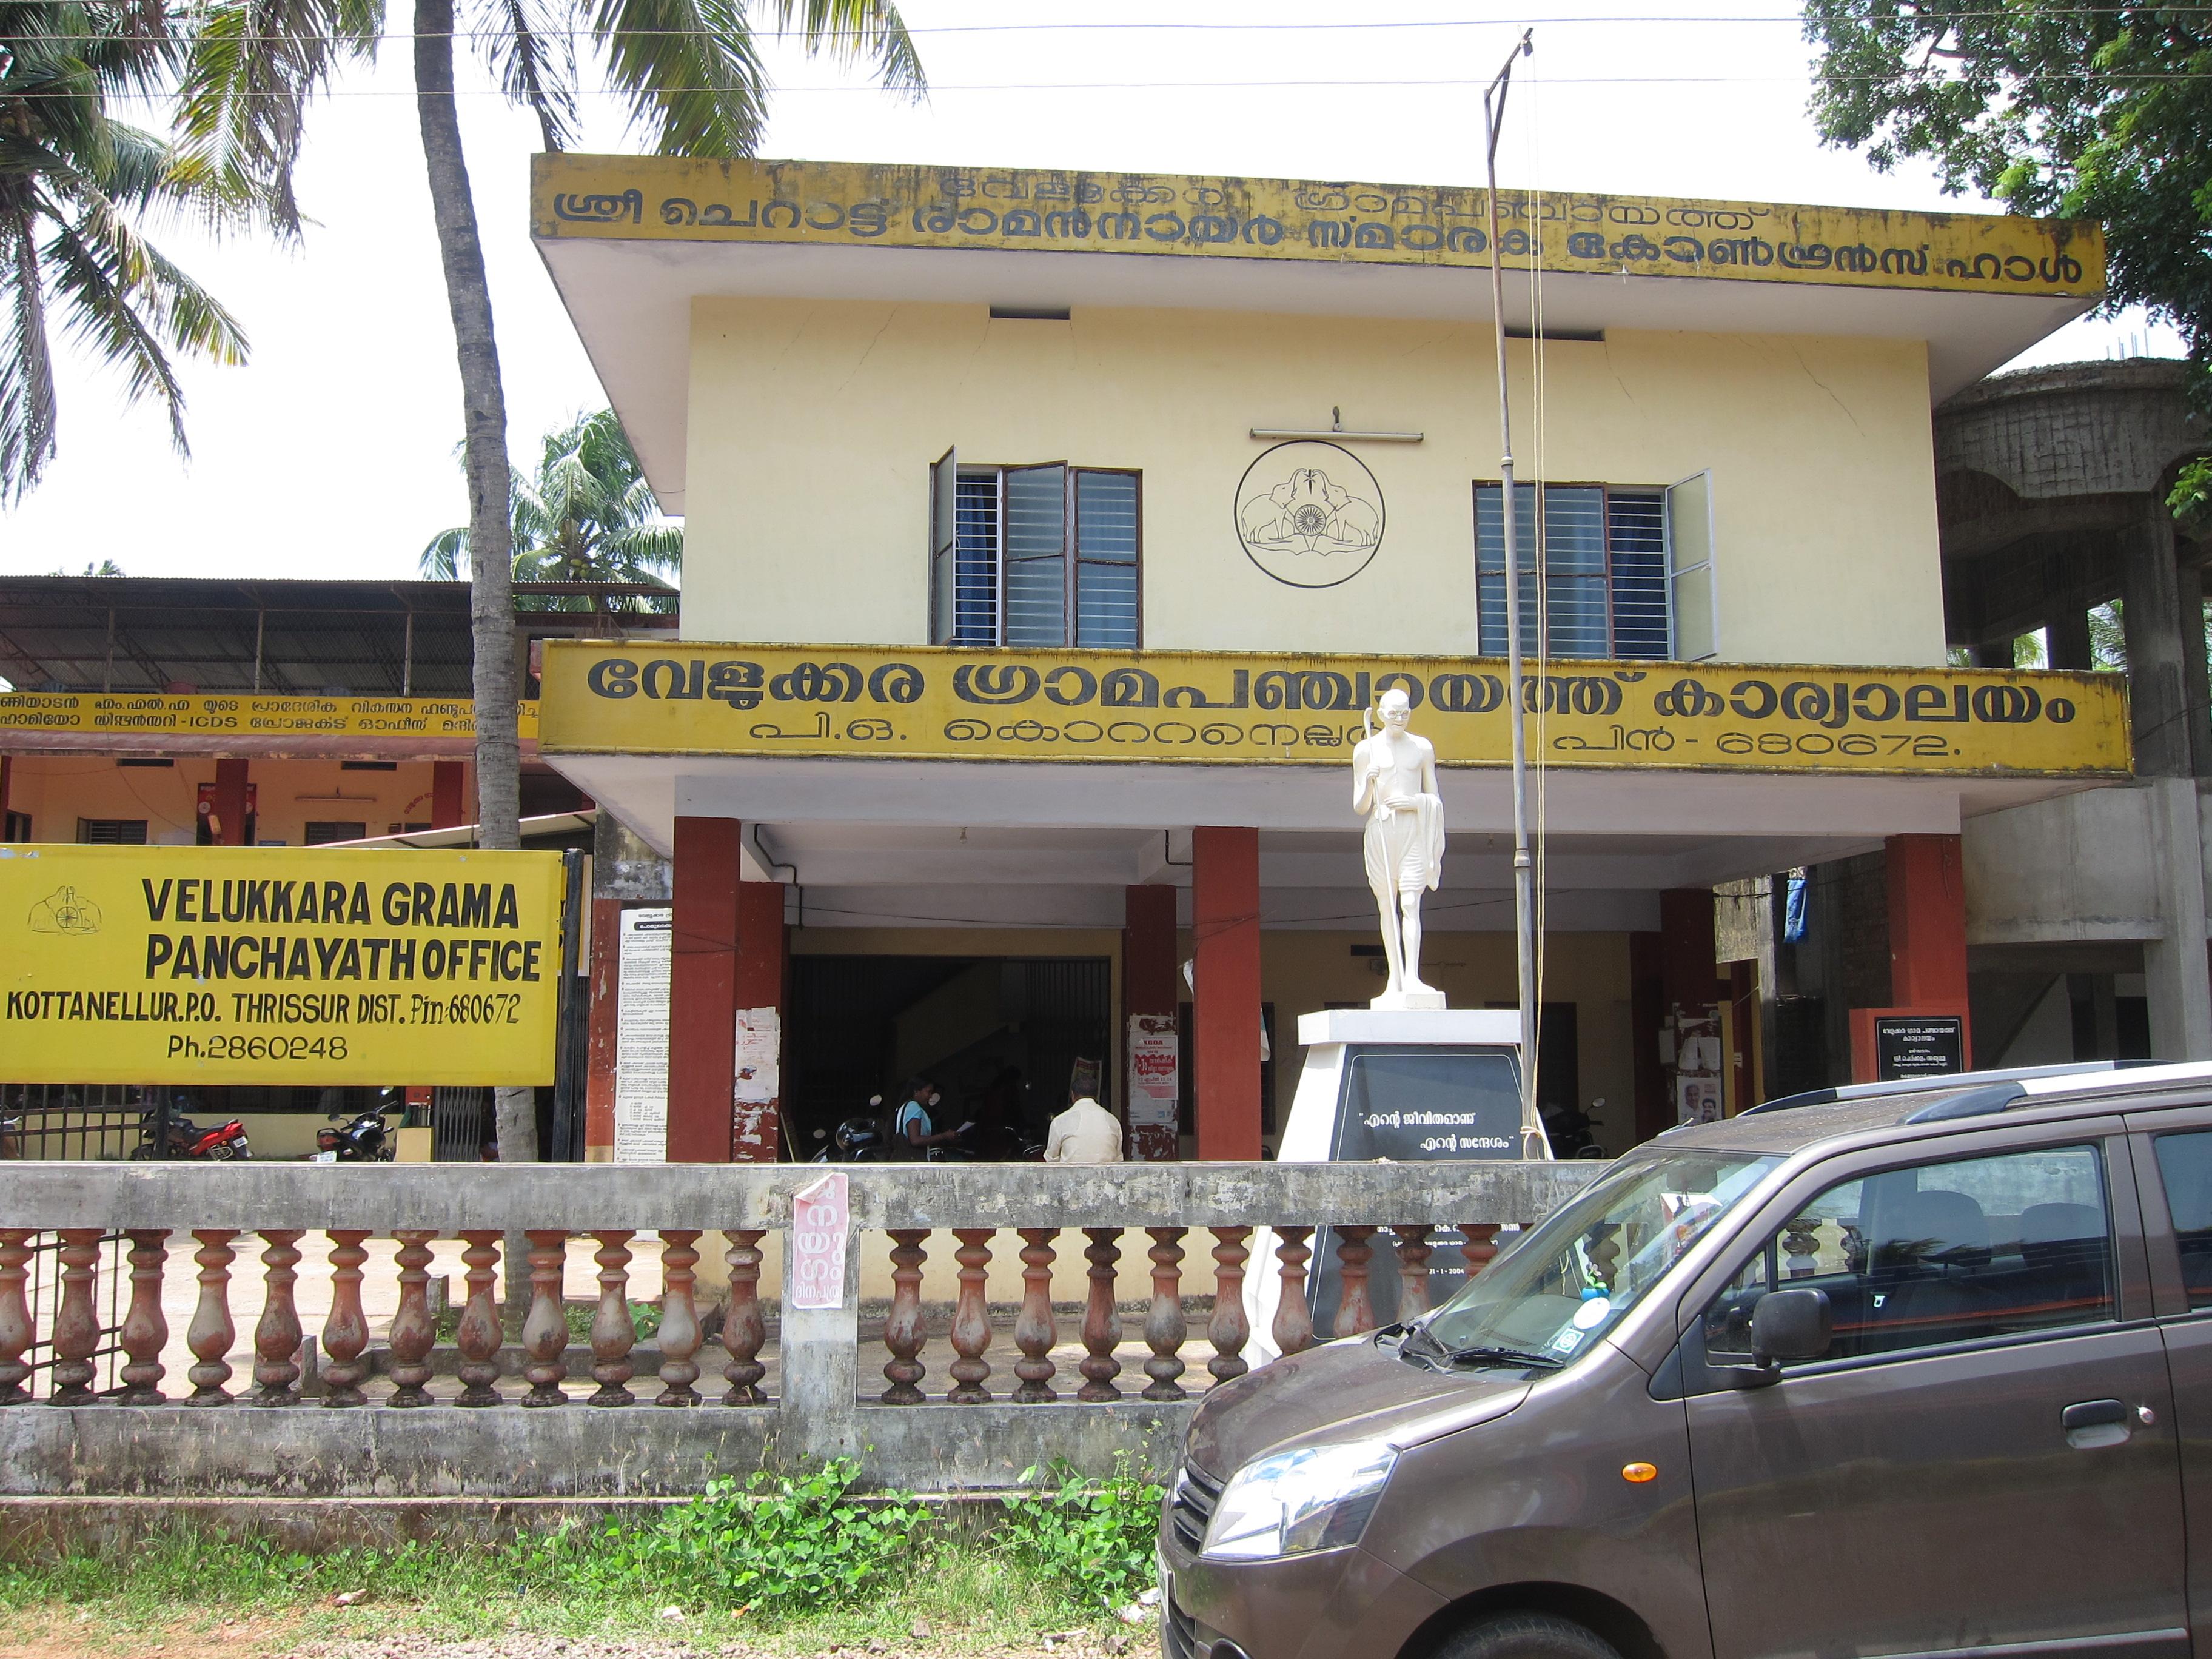 Velukkara Grama Panchayath Image